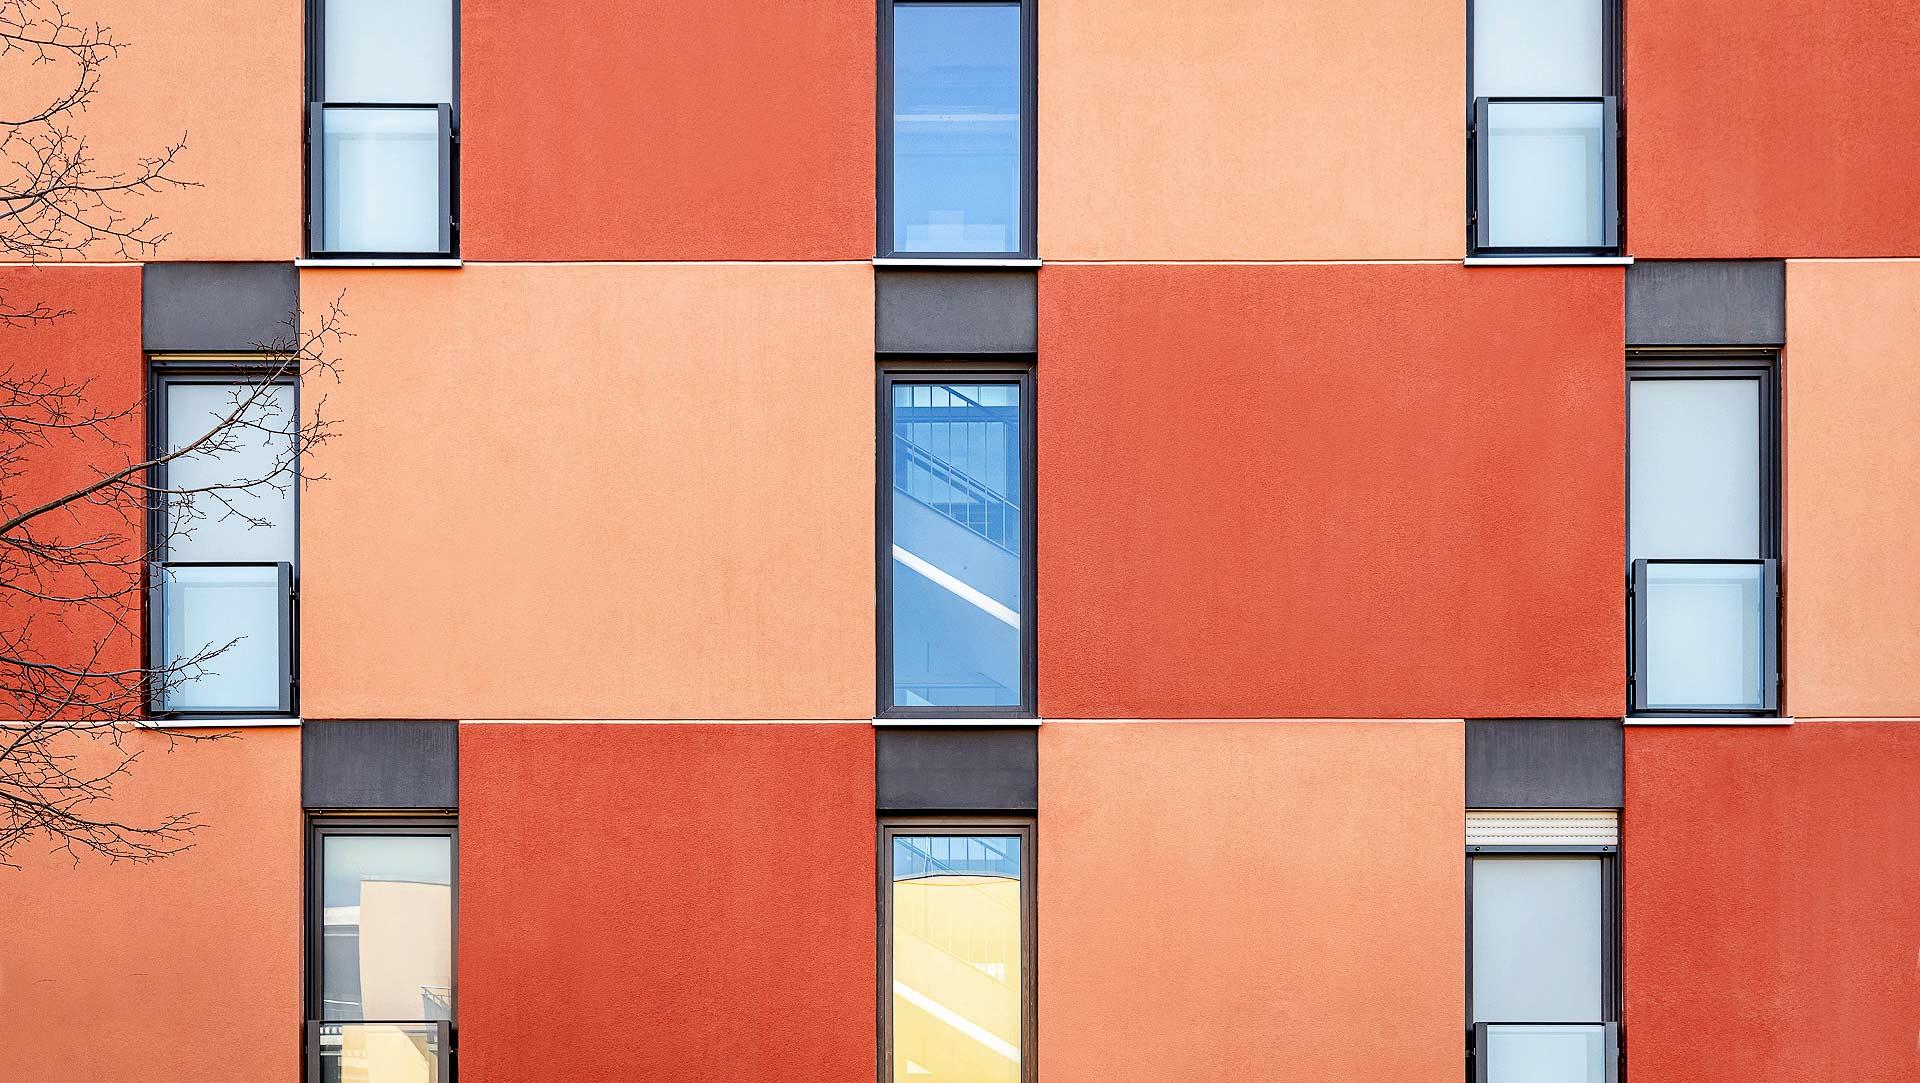 detail-gebaude-fassade-geometrien-farbflaechen